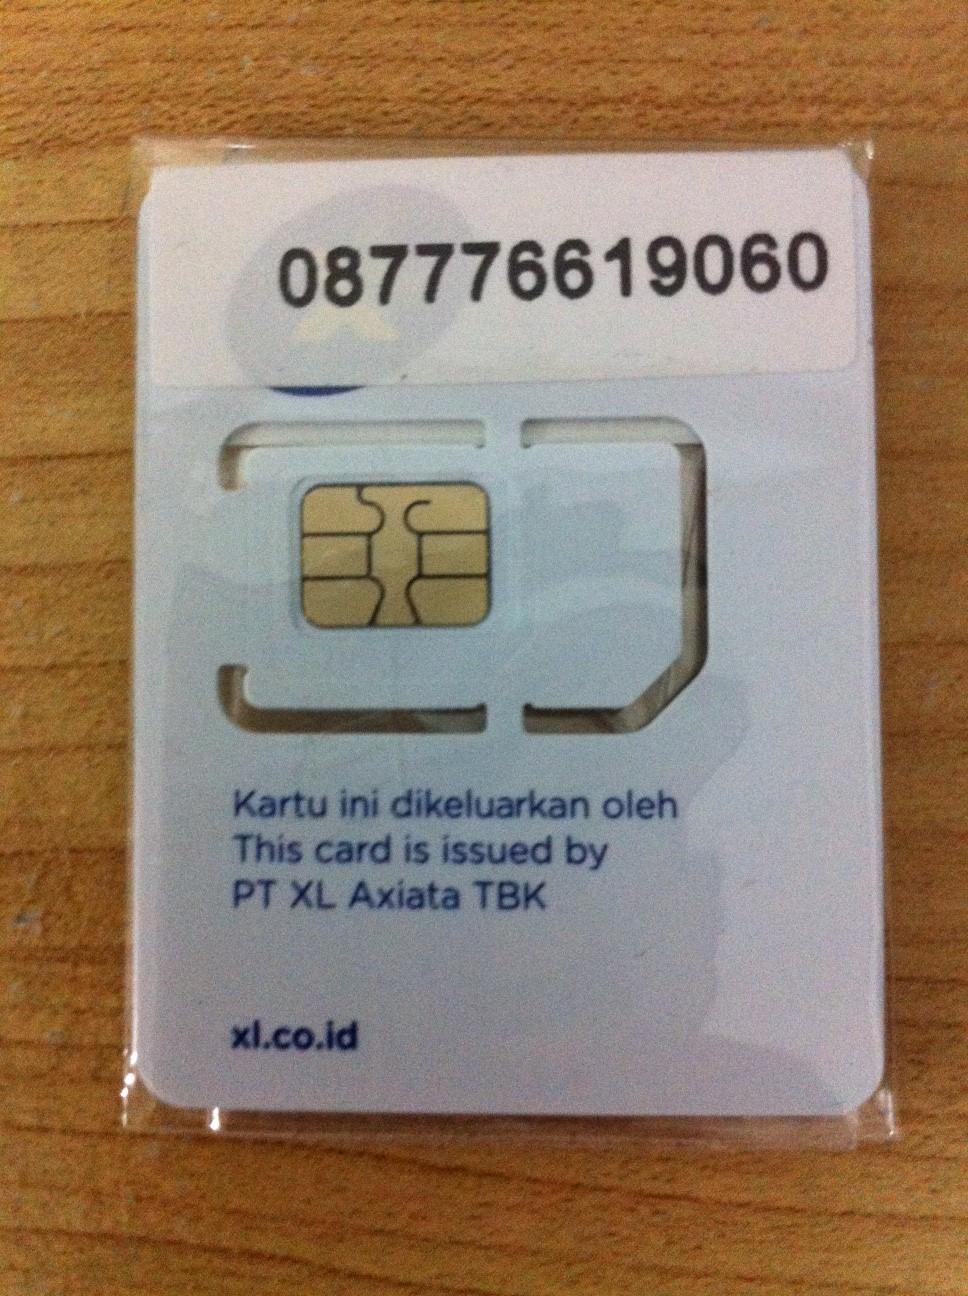 Jual Perdana Xl 4g Cantik Micro Sim Card Rp 35000 Circle Se7en Kartu Axiata Tokopedia